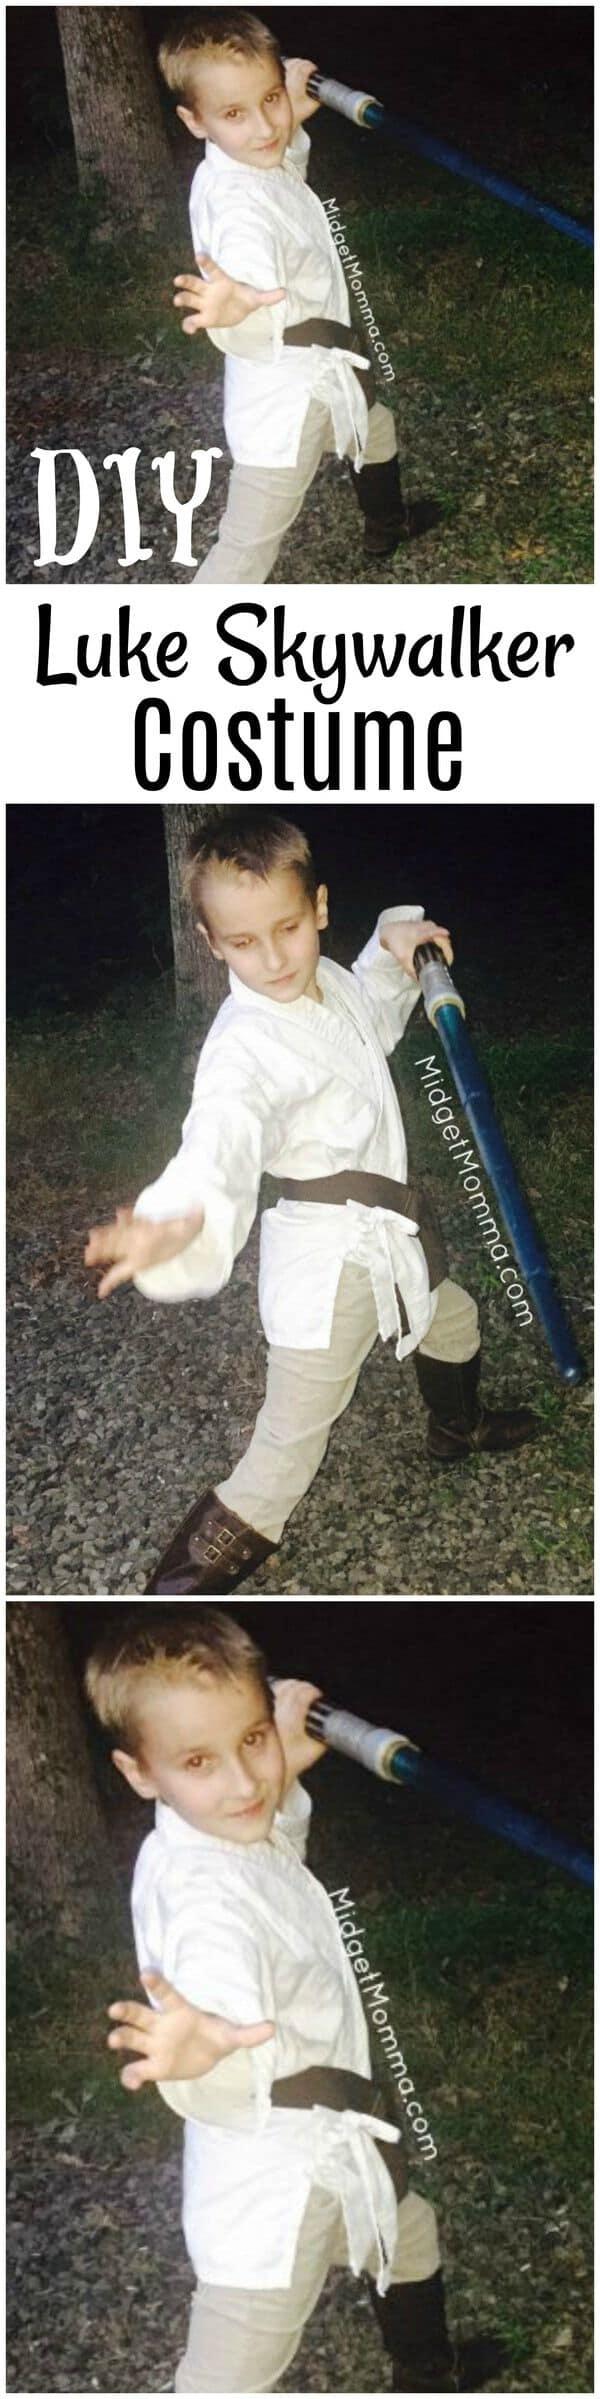 DIY Luke Skywalker Star Wars Costume